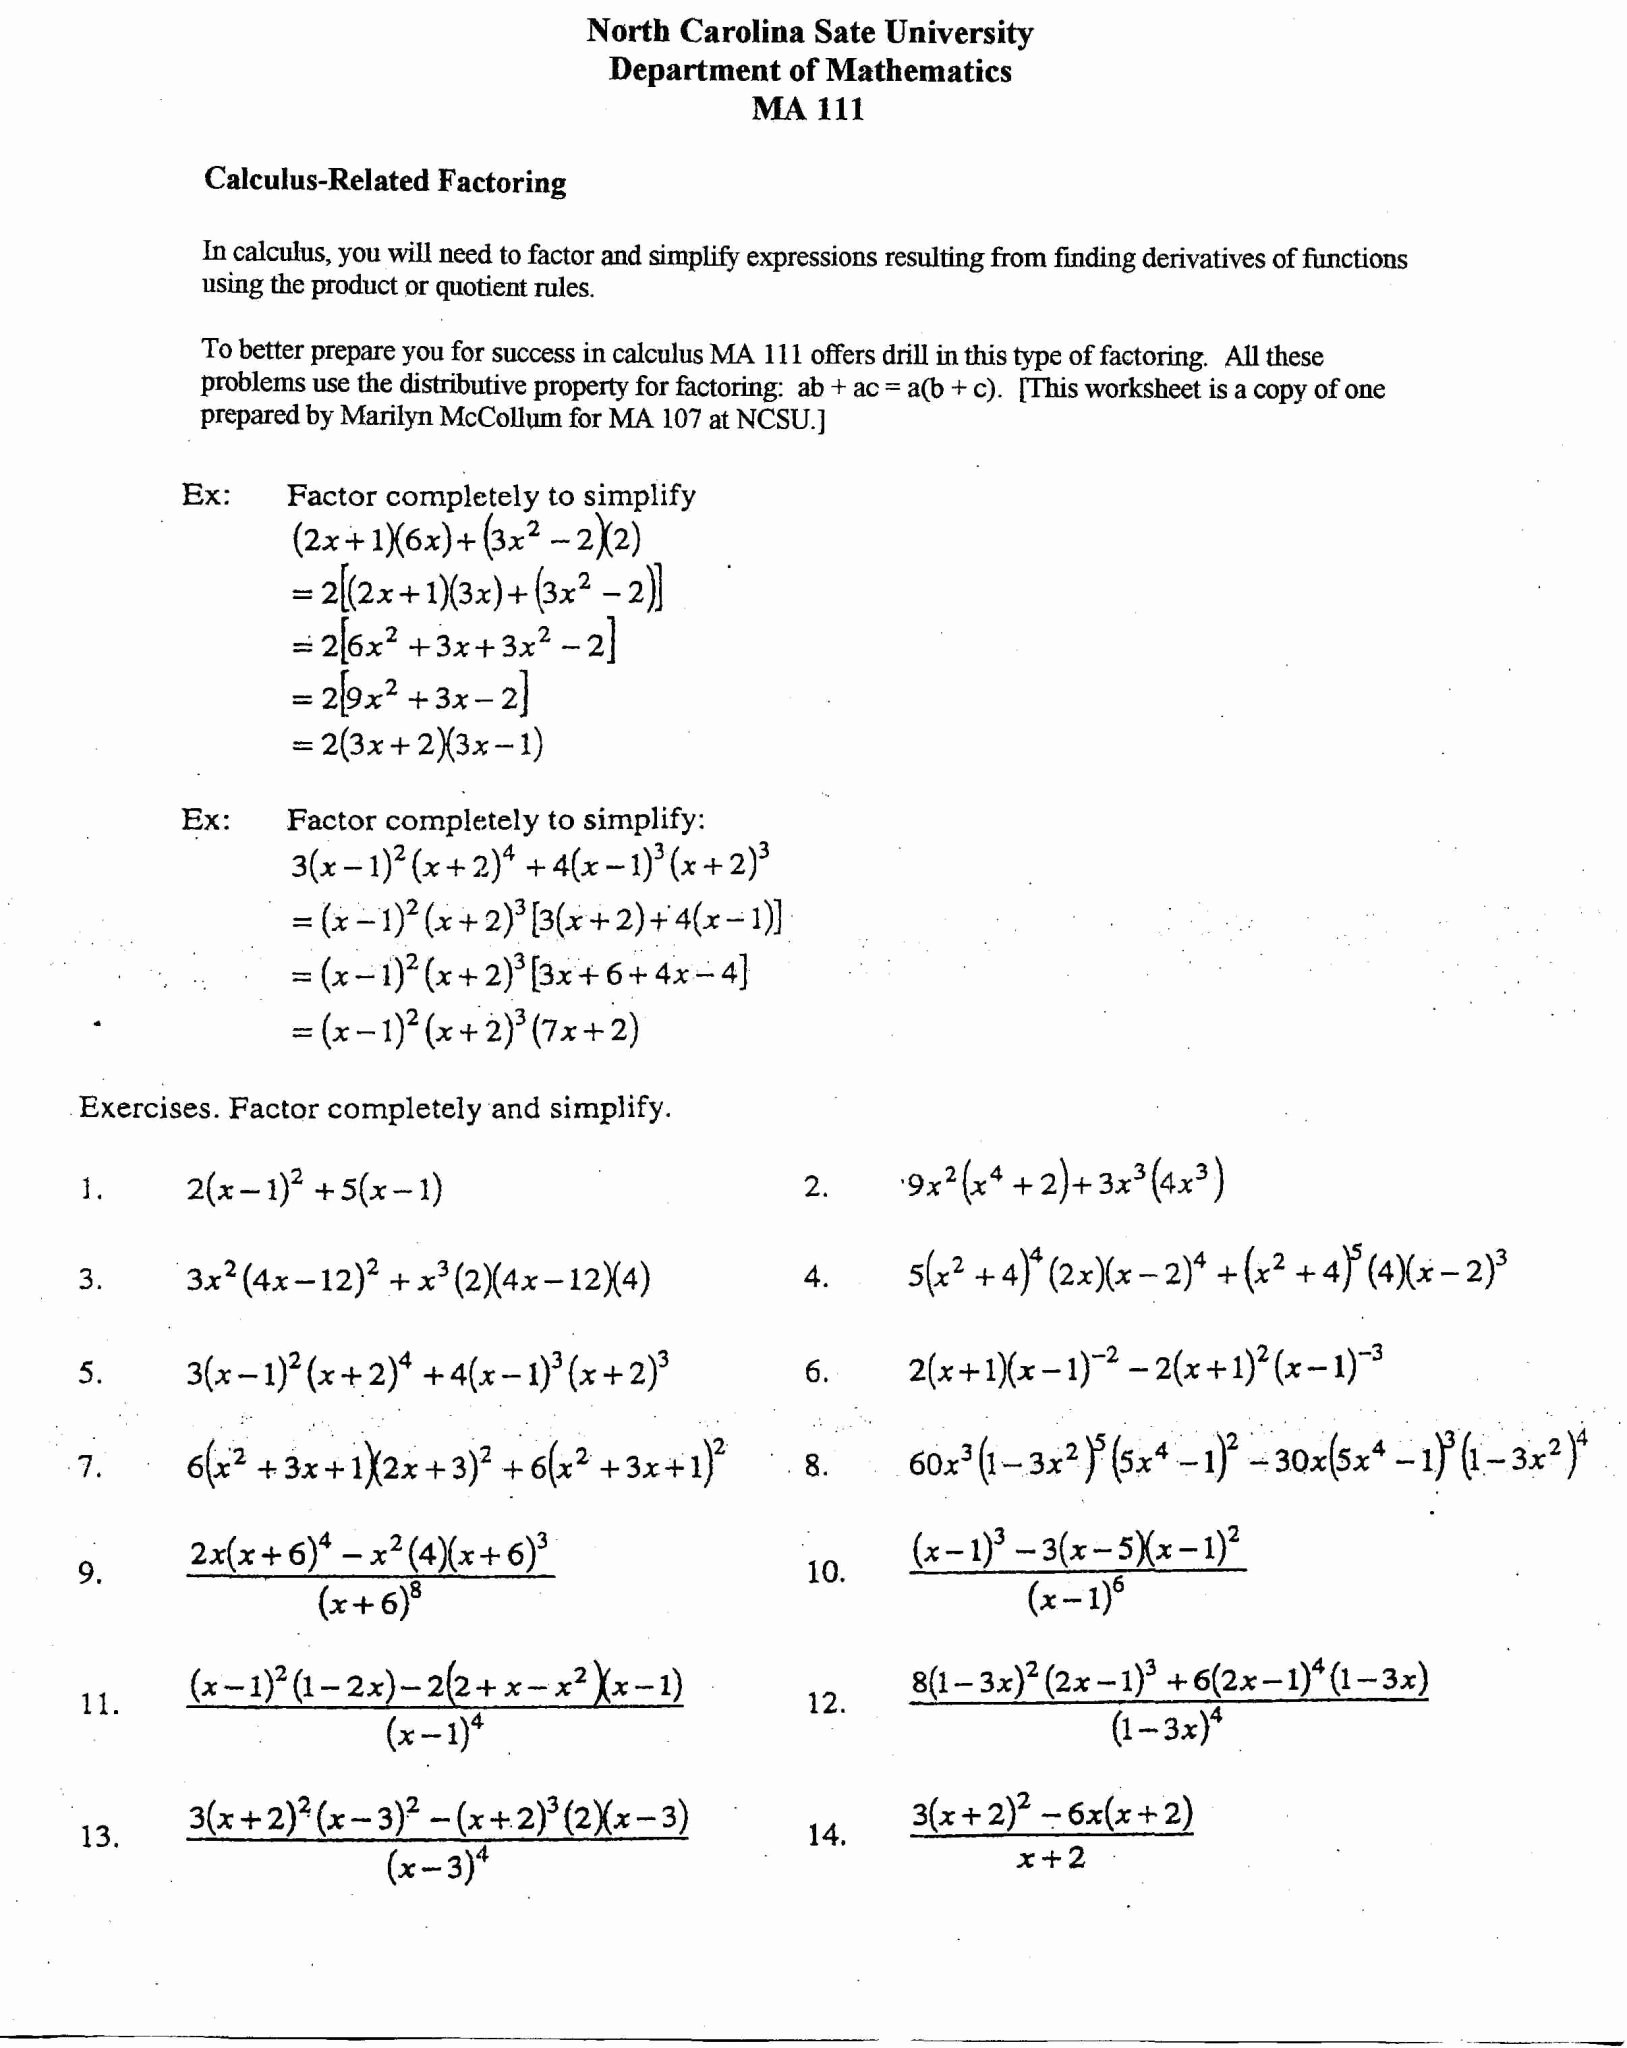 Distributive Property Worksheet Answers Lovely Factoring Using the Distributive Property Worksheet